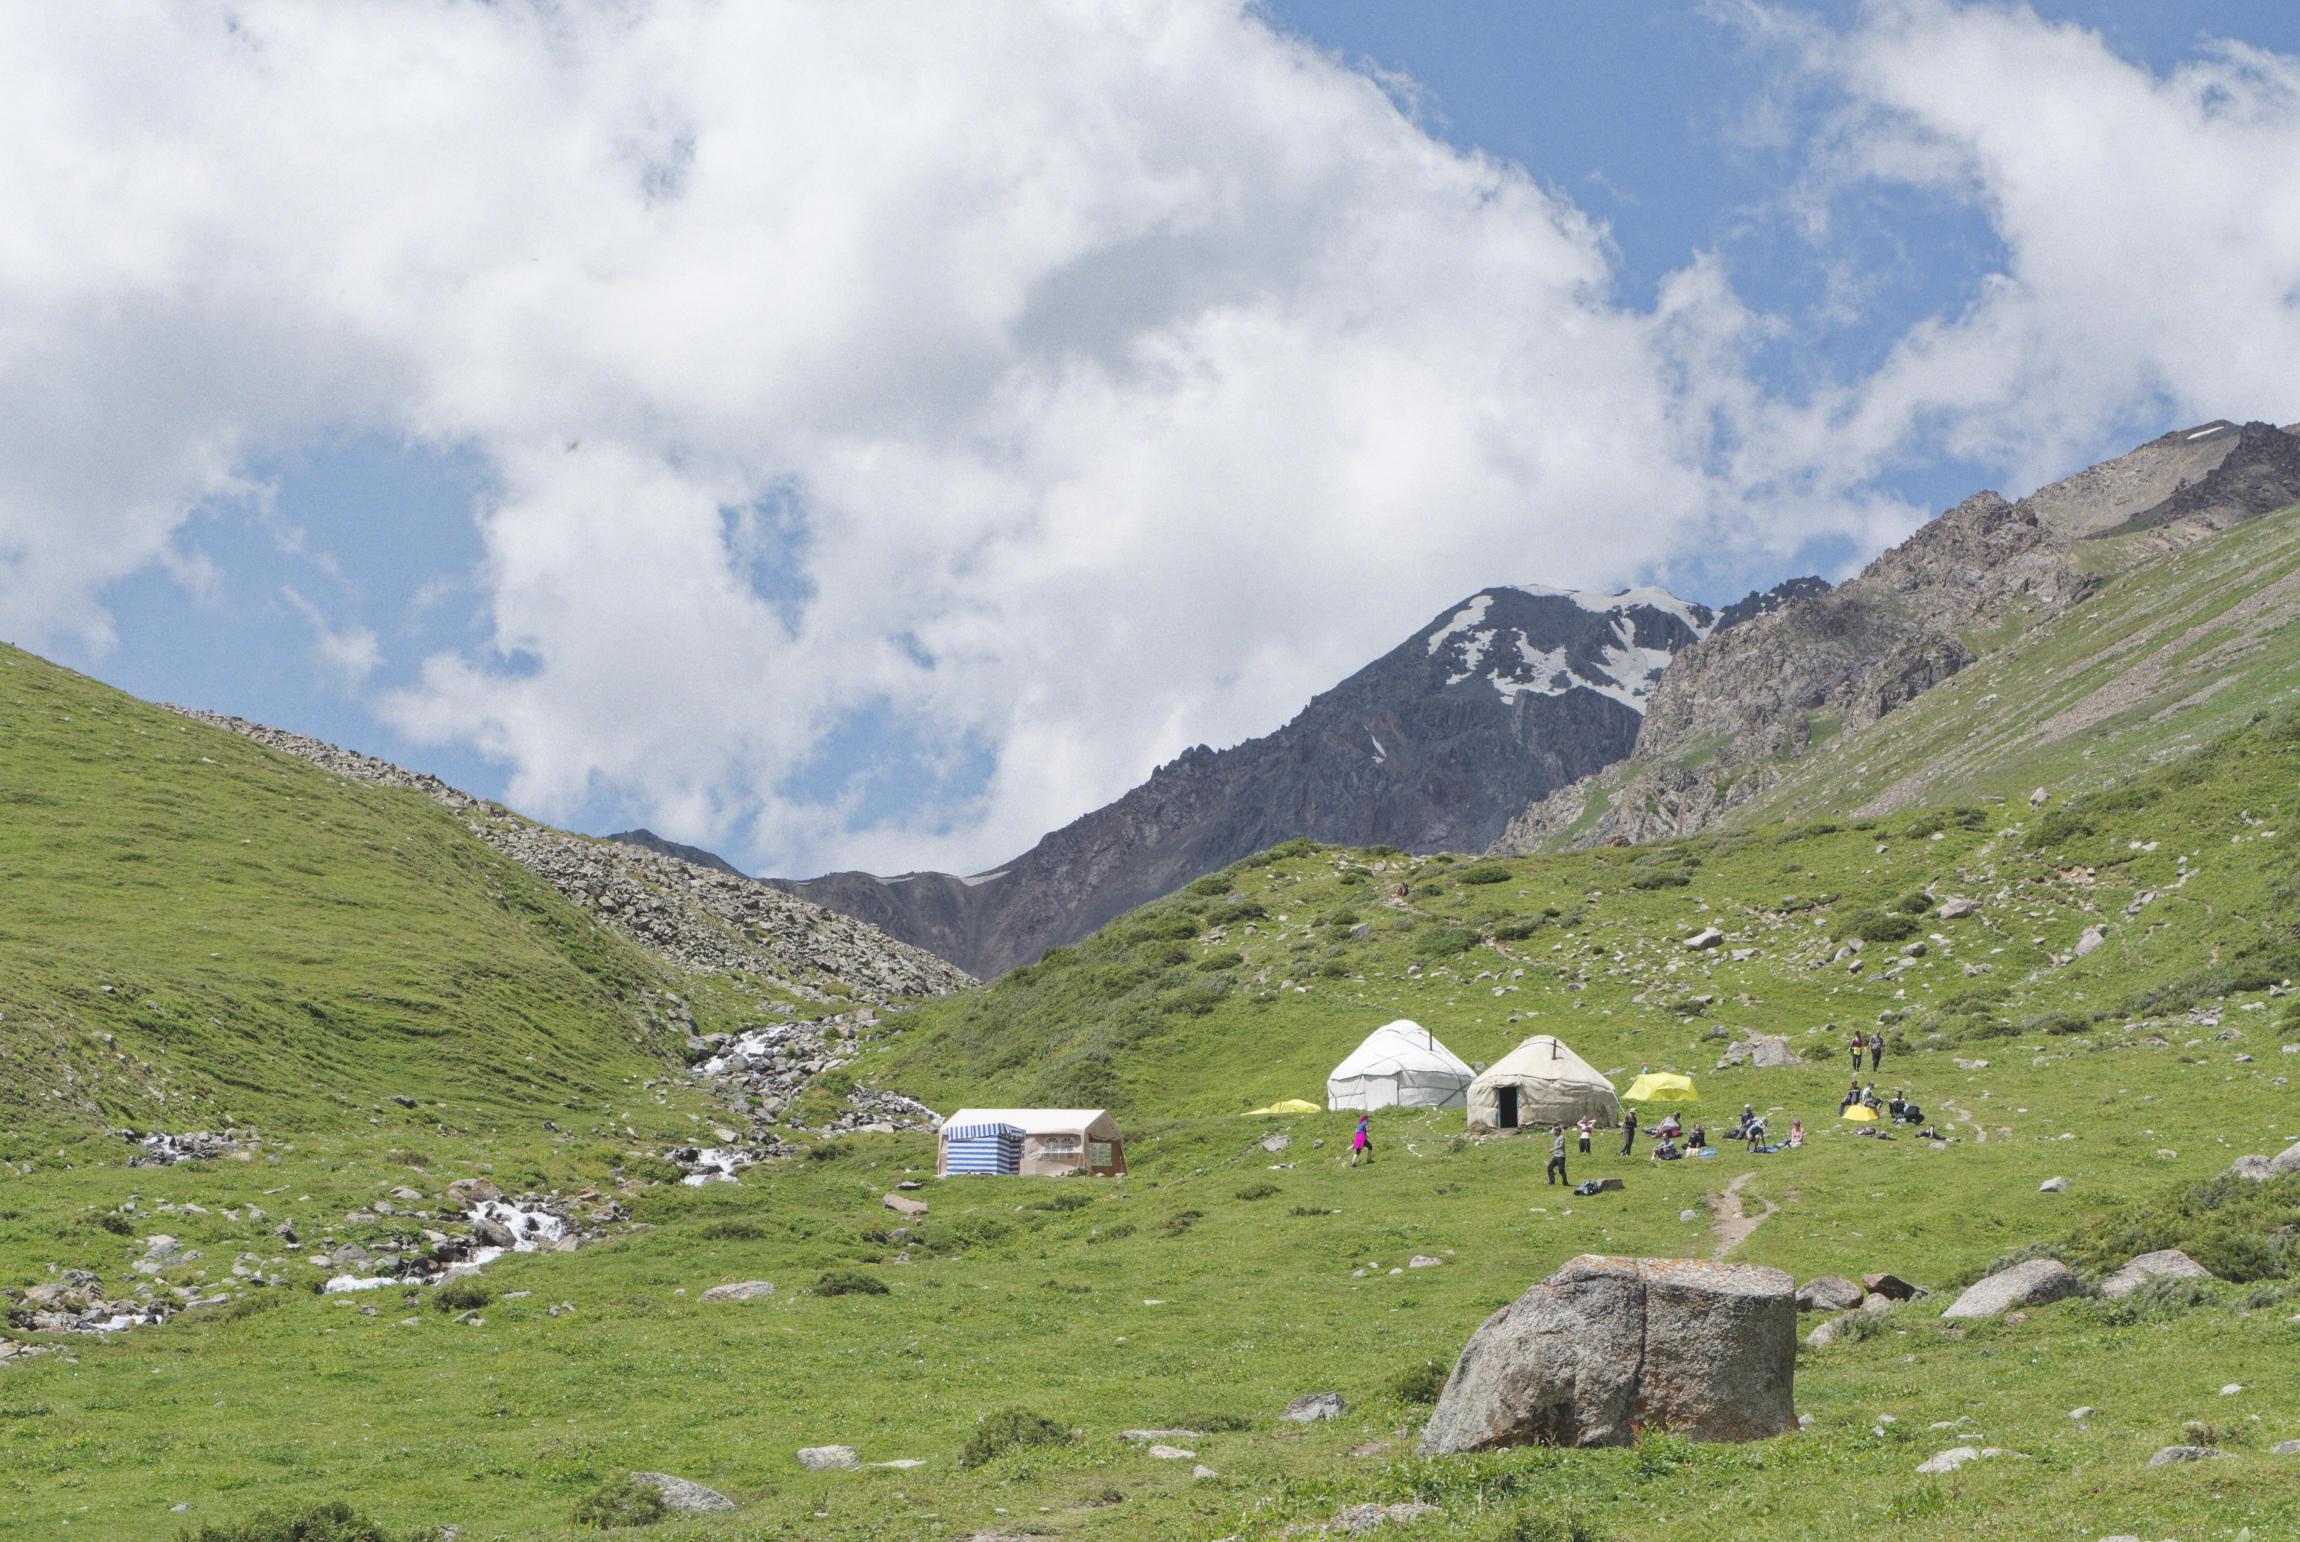 Montagne et yourtes trek d'Ala Kul Kirghizstan